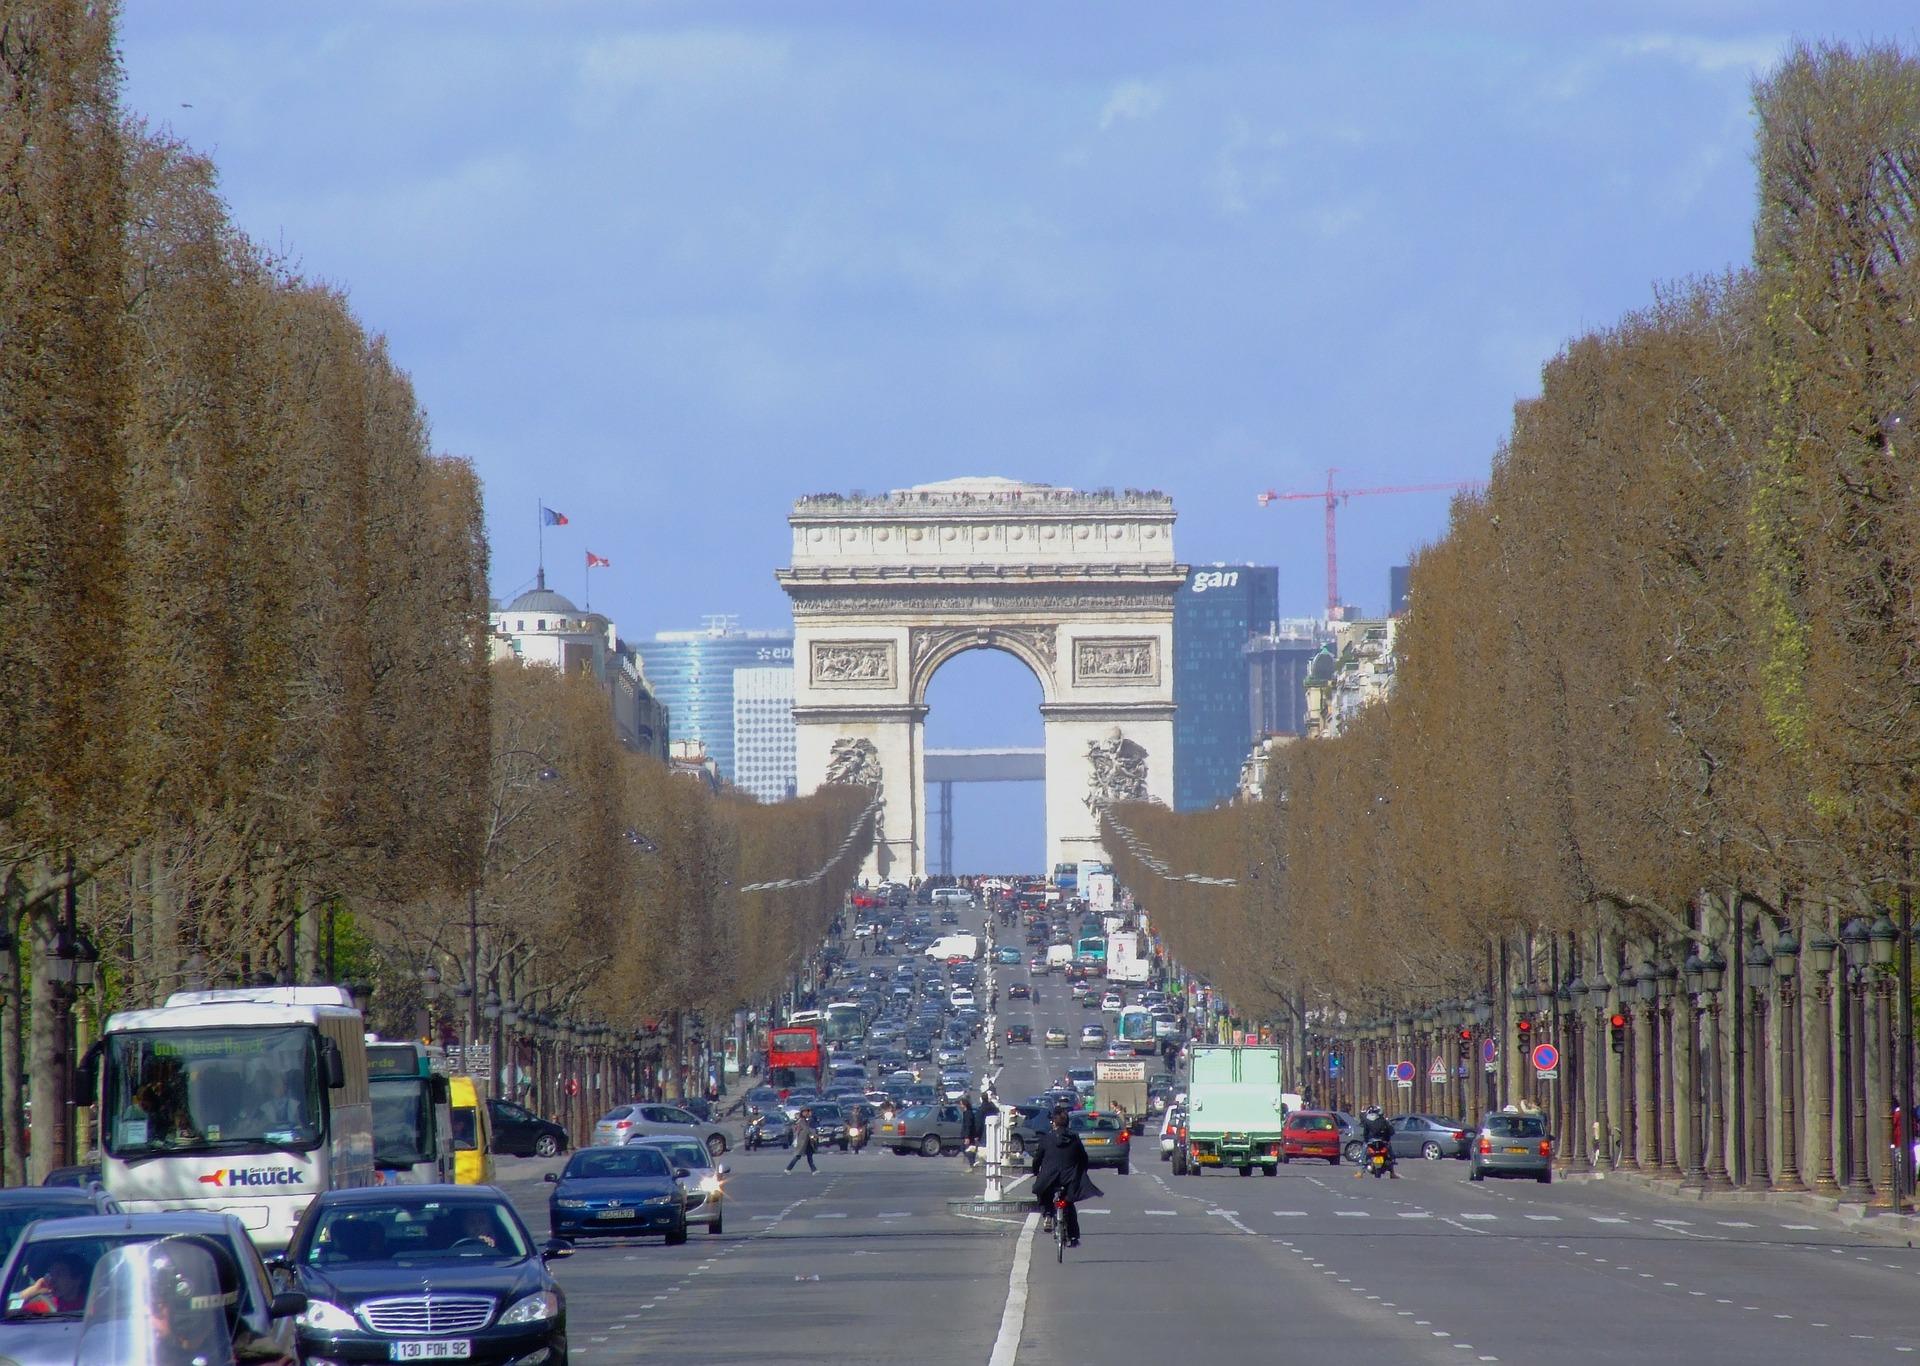 paris-91211_1920.jpg